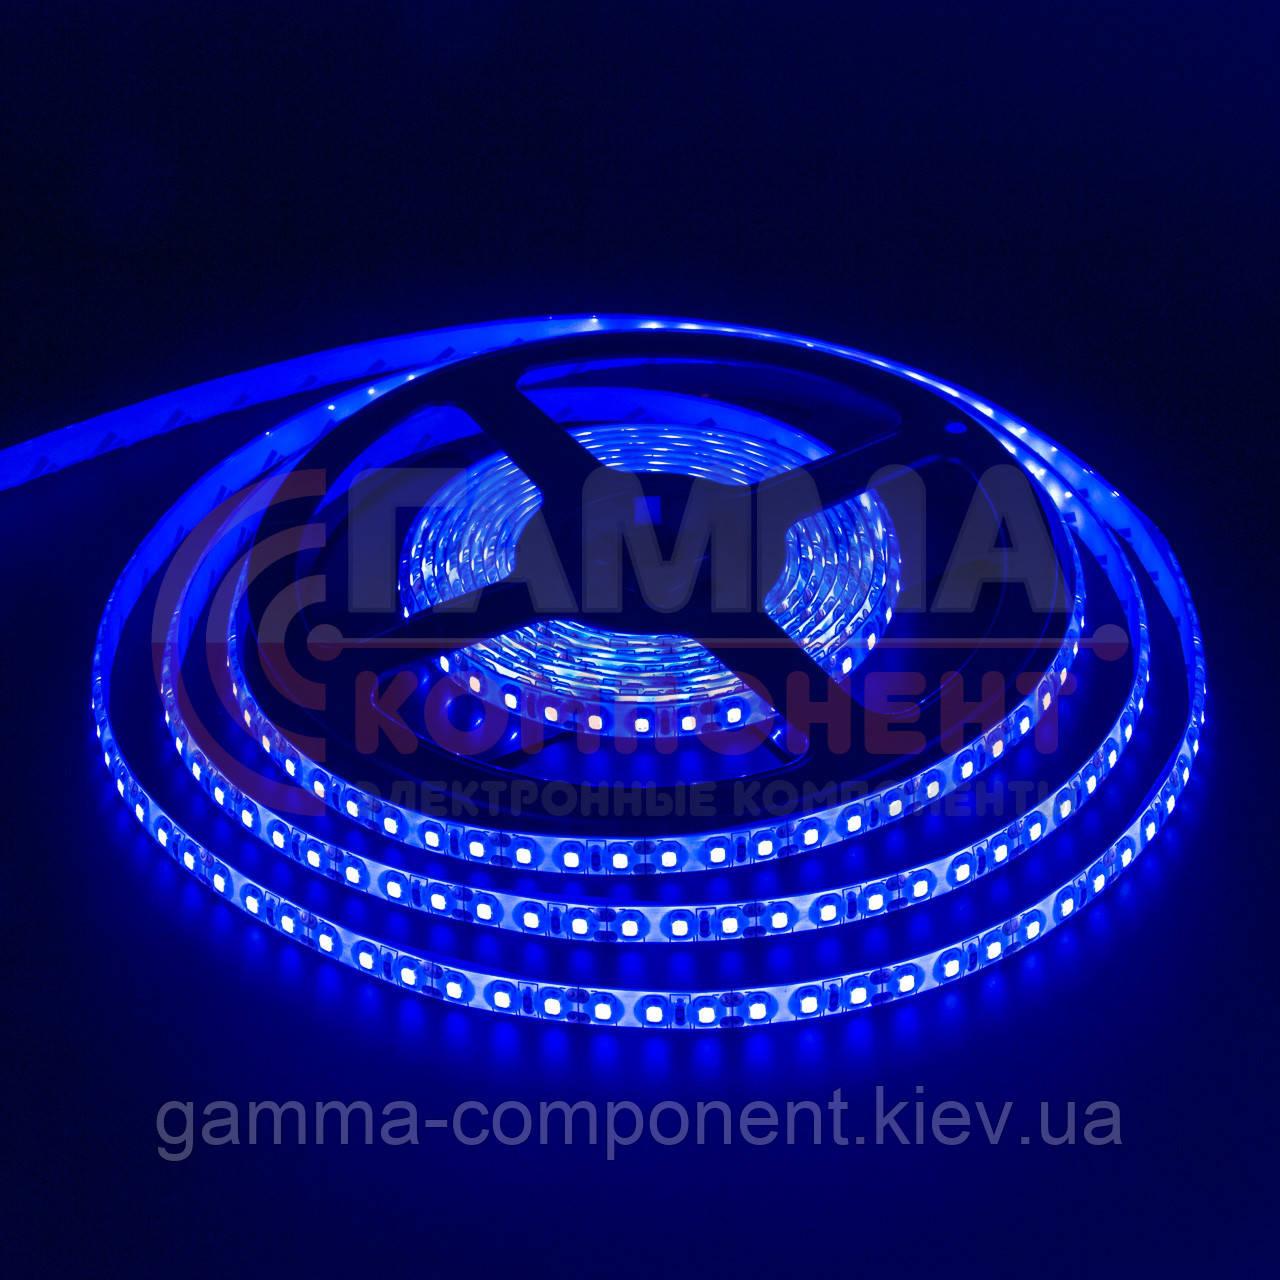 Светодиодная лента SMD 2835 (120 LED/м), синий, IP20, 12В, бобины от 5 метров